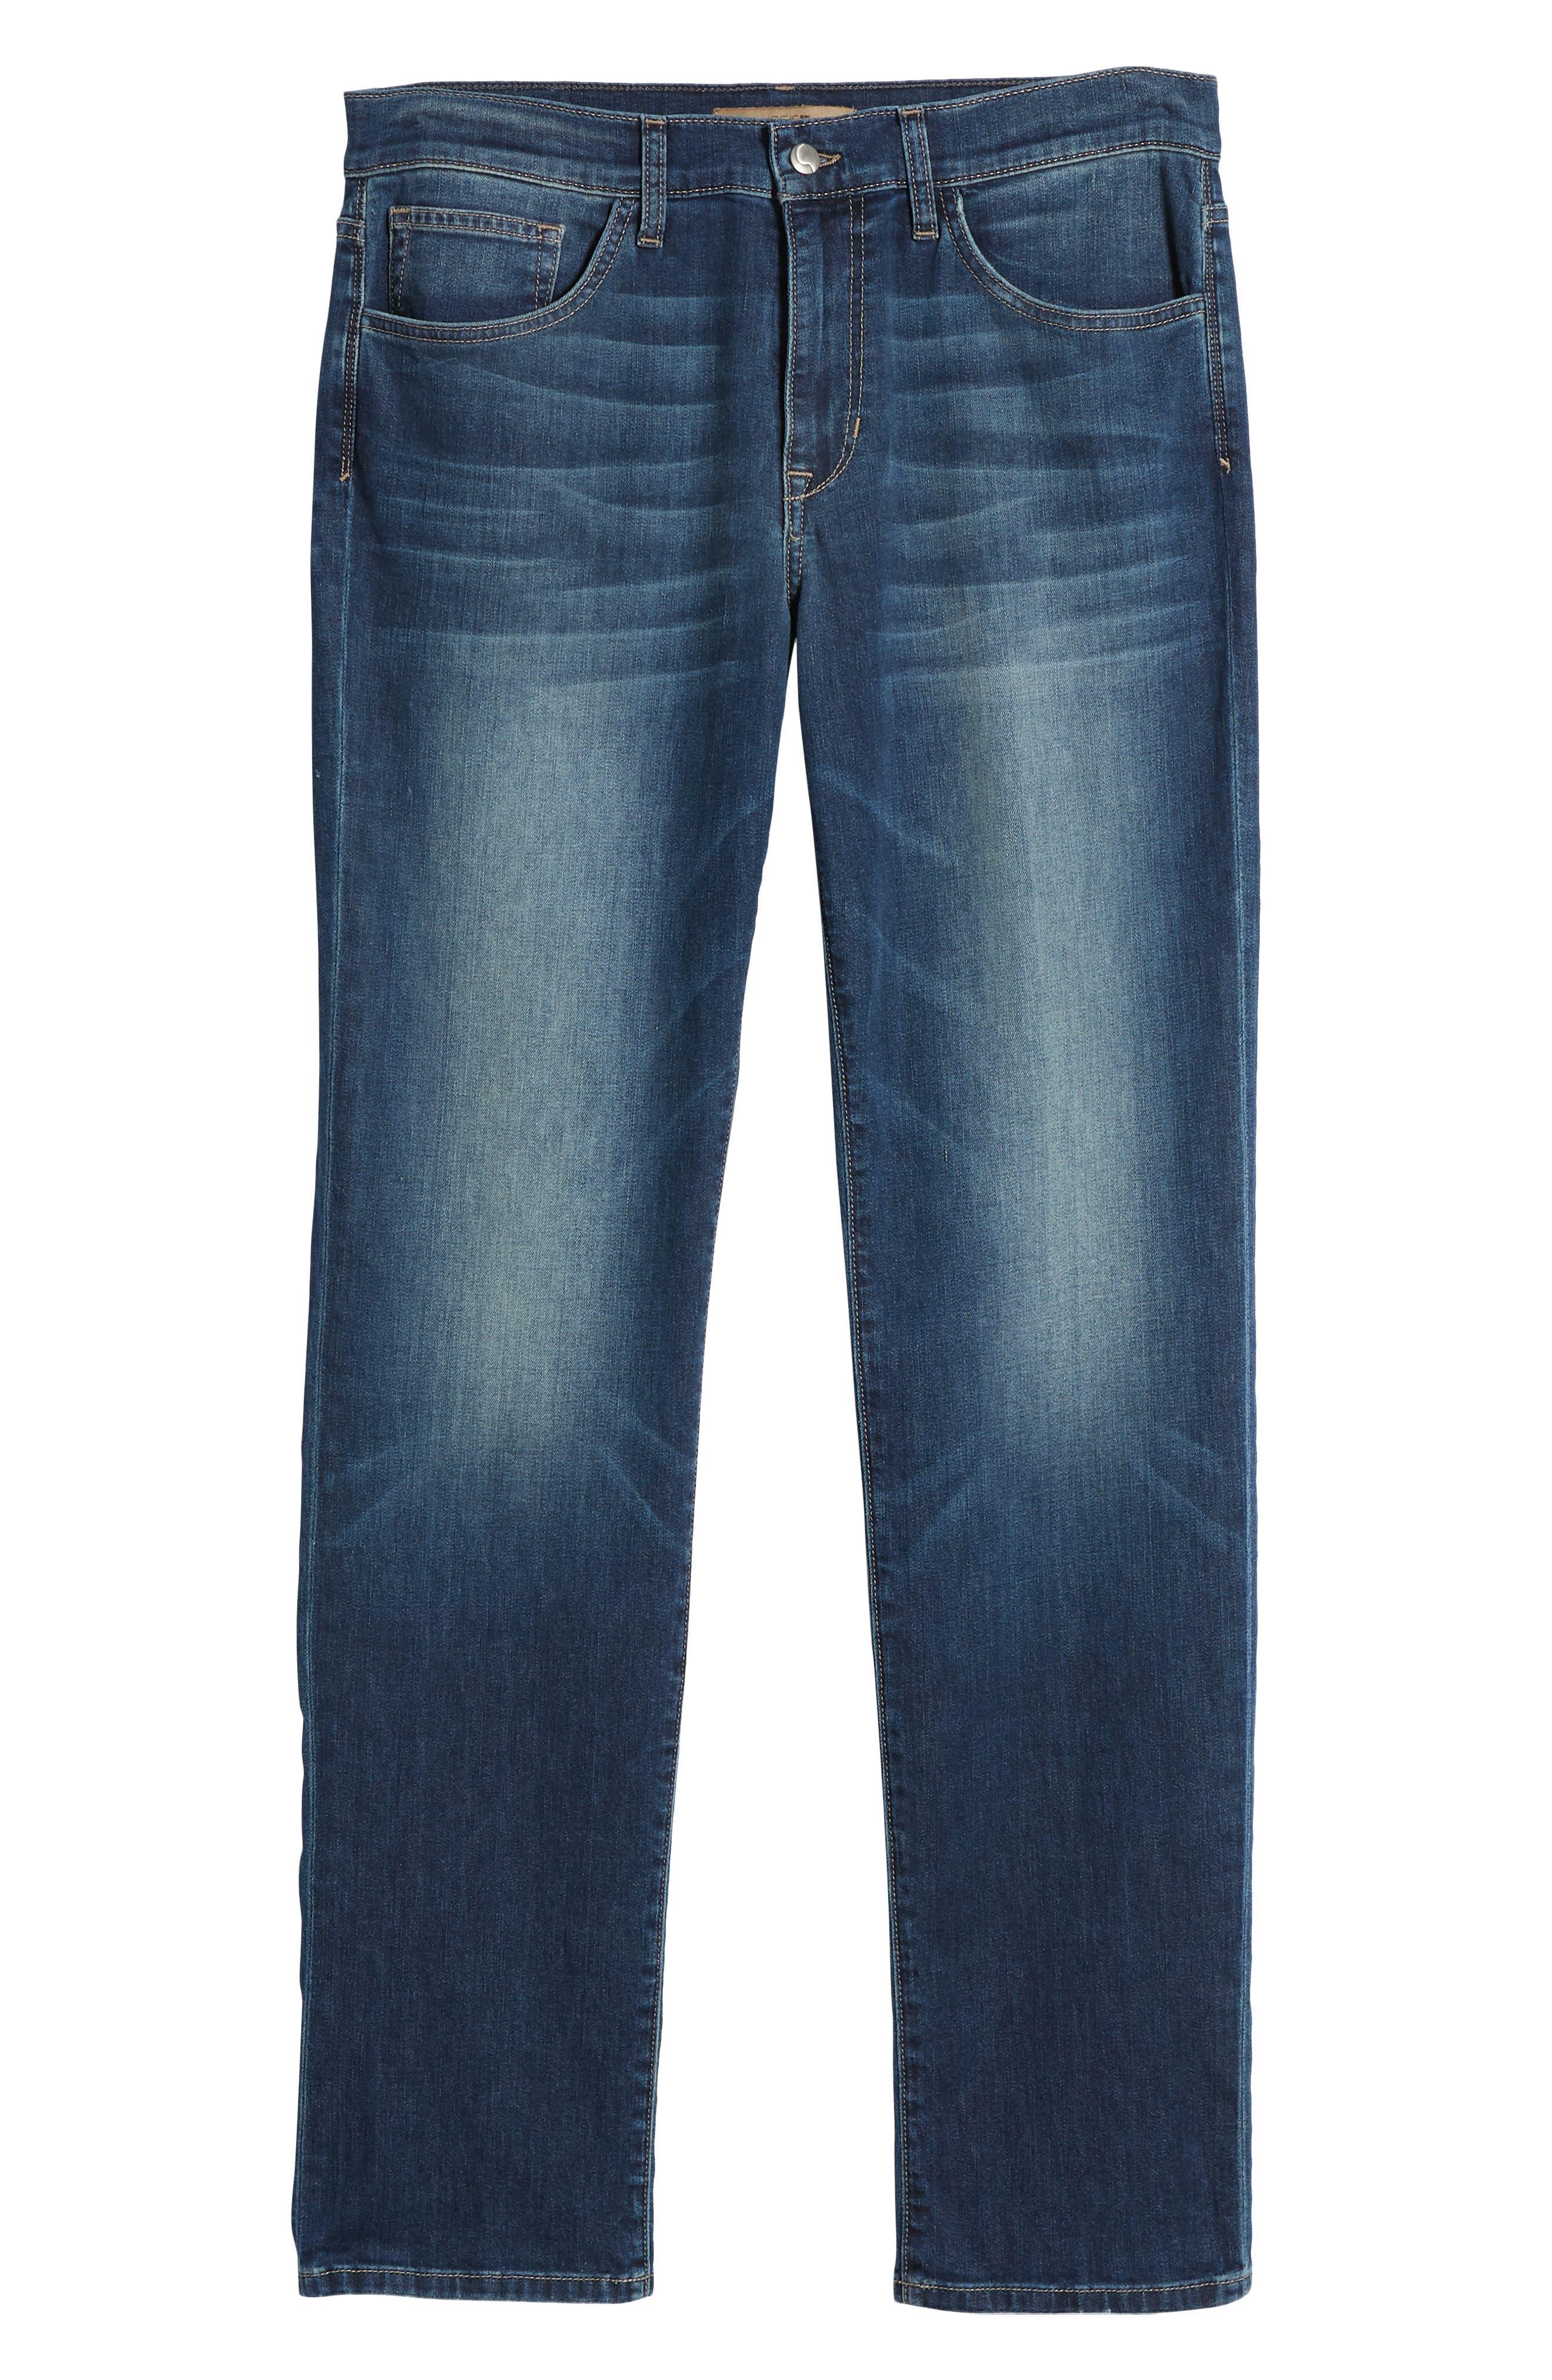 Brixton Slim Straight Fit Jeans,                             Alternate thumbnail 6, color,                             Brady